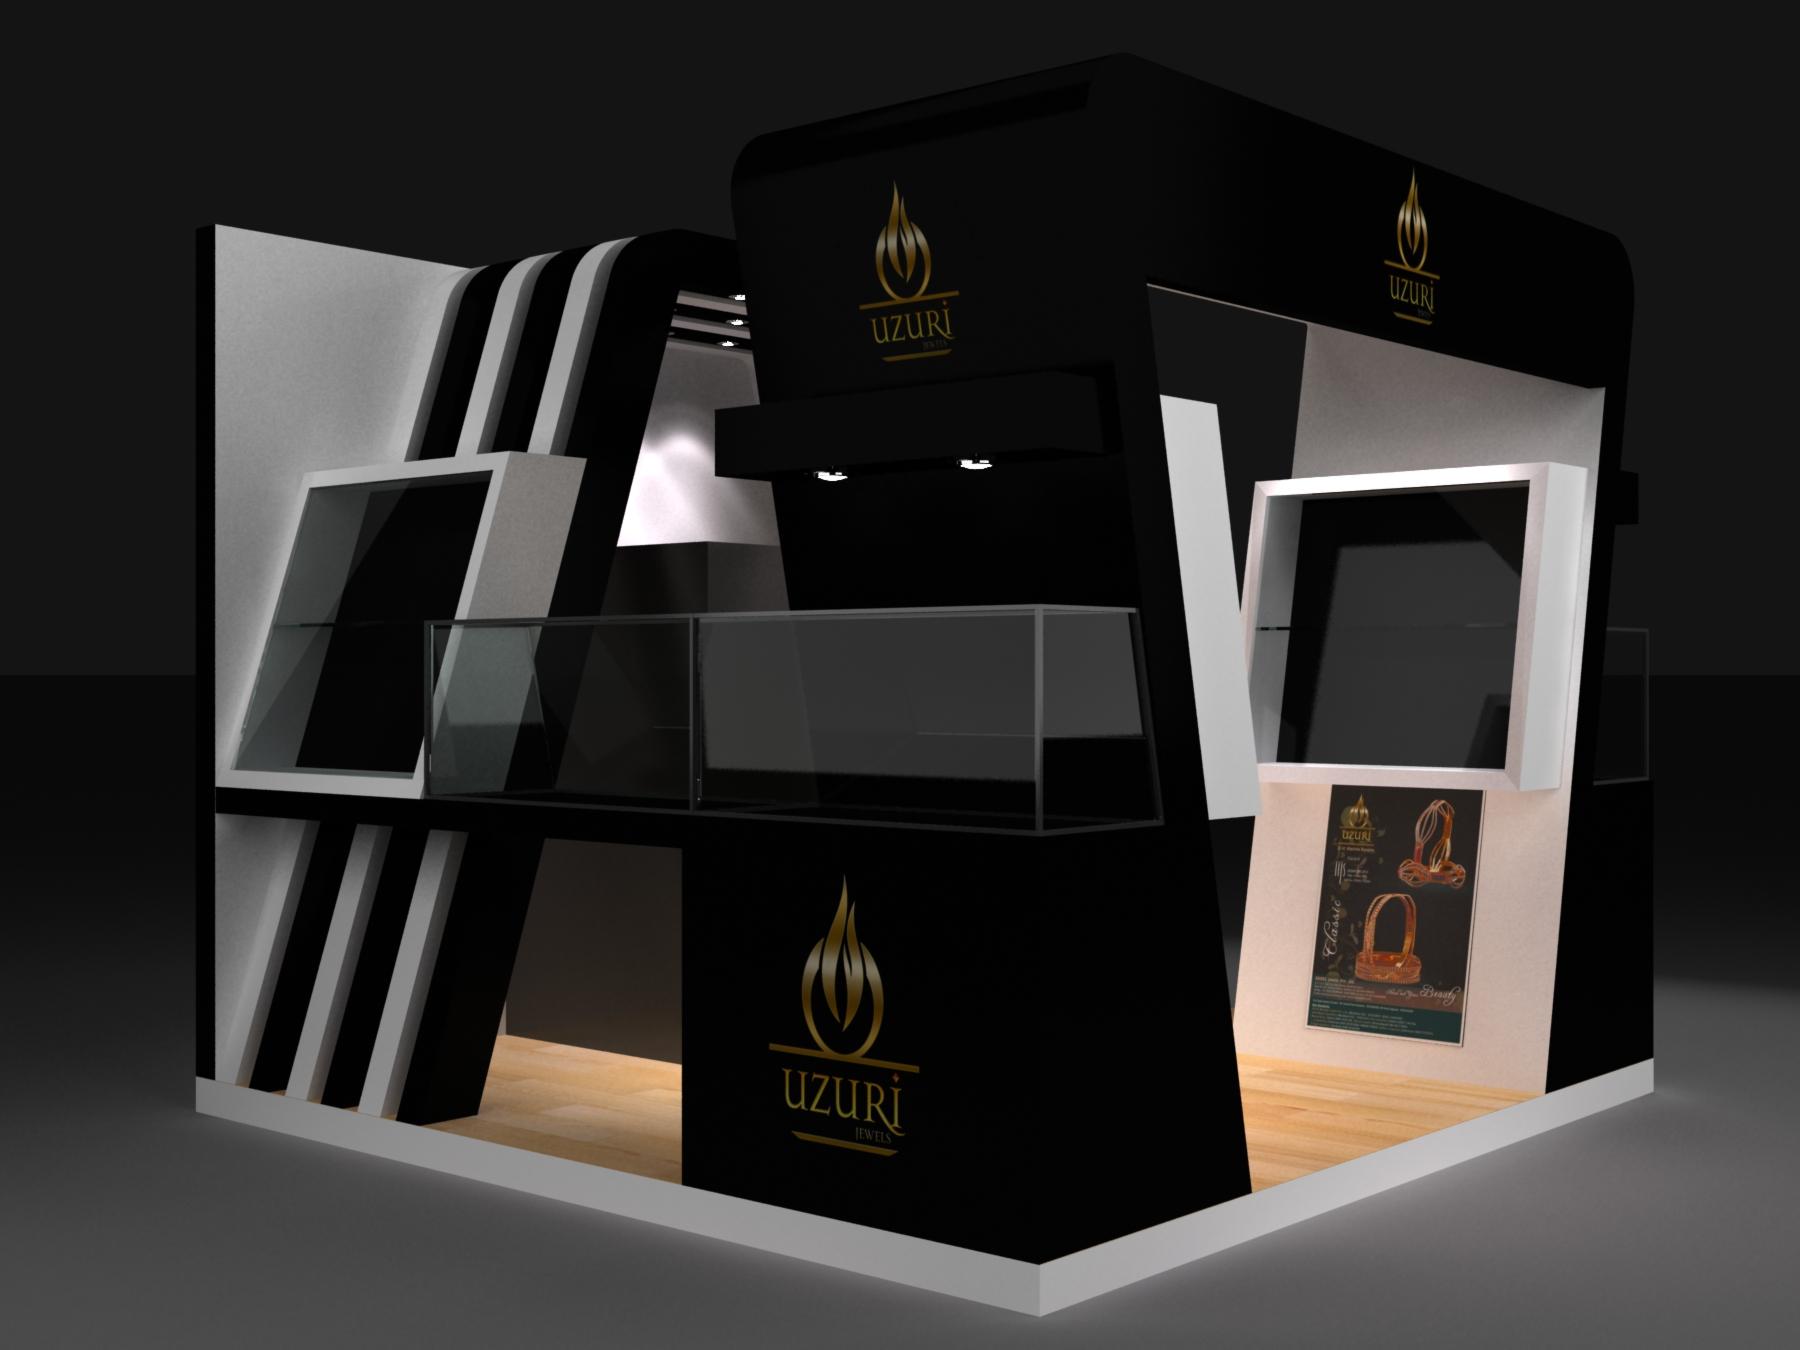 Jewellery Exhibition Stall Design : Jewellery exhibition stall by vishal champanerkar at